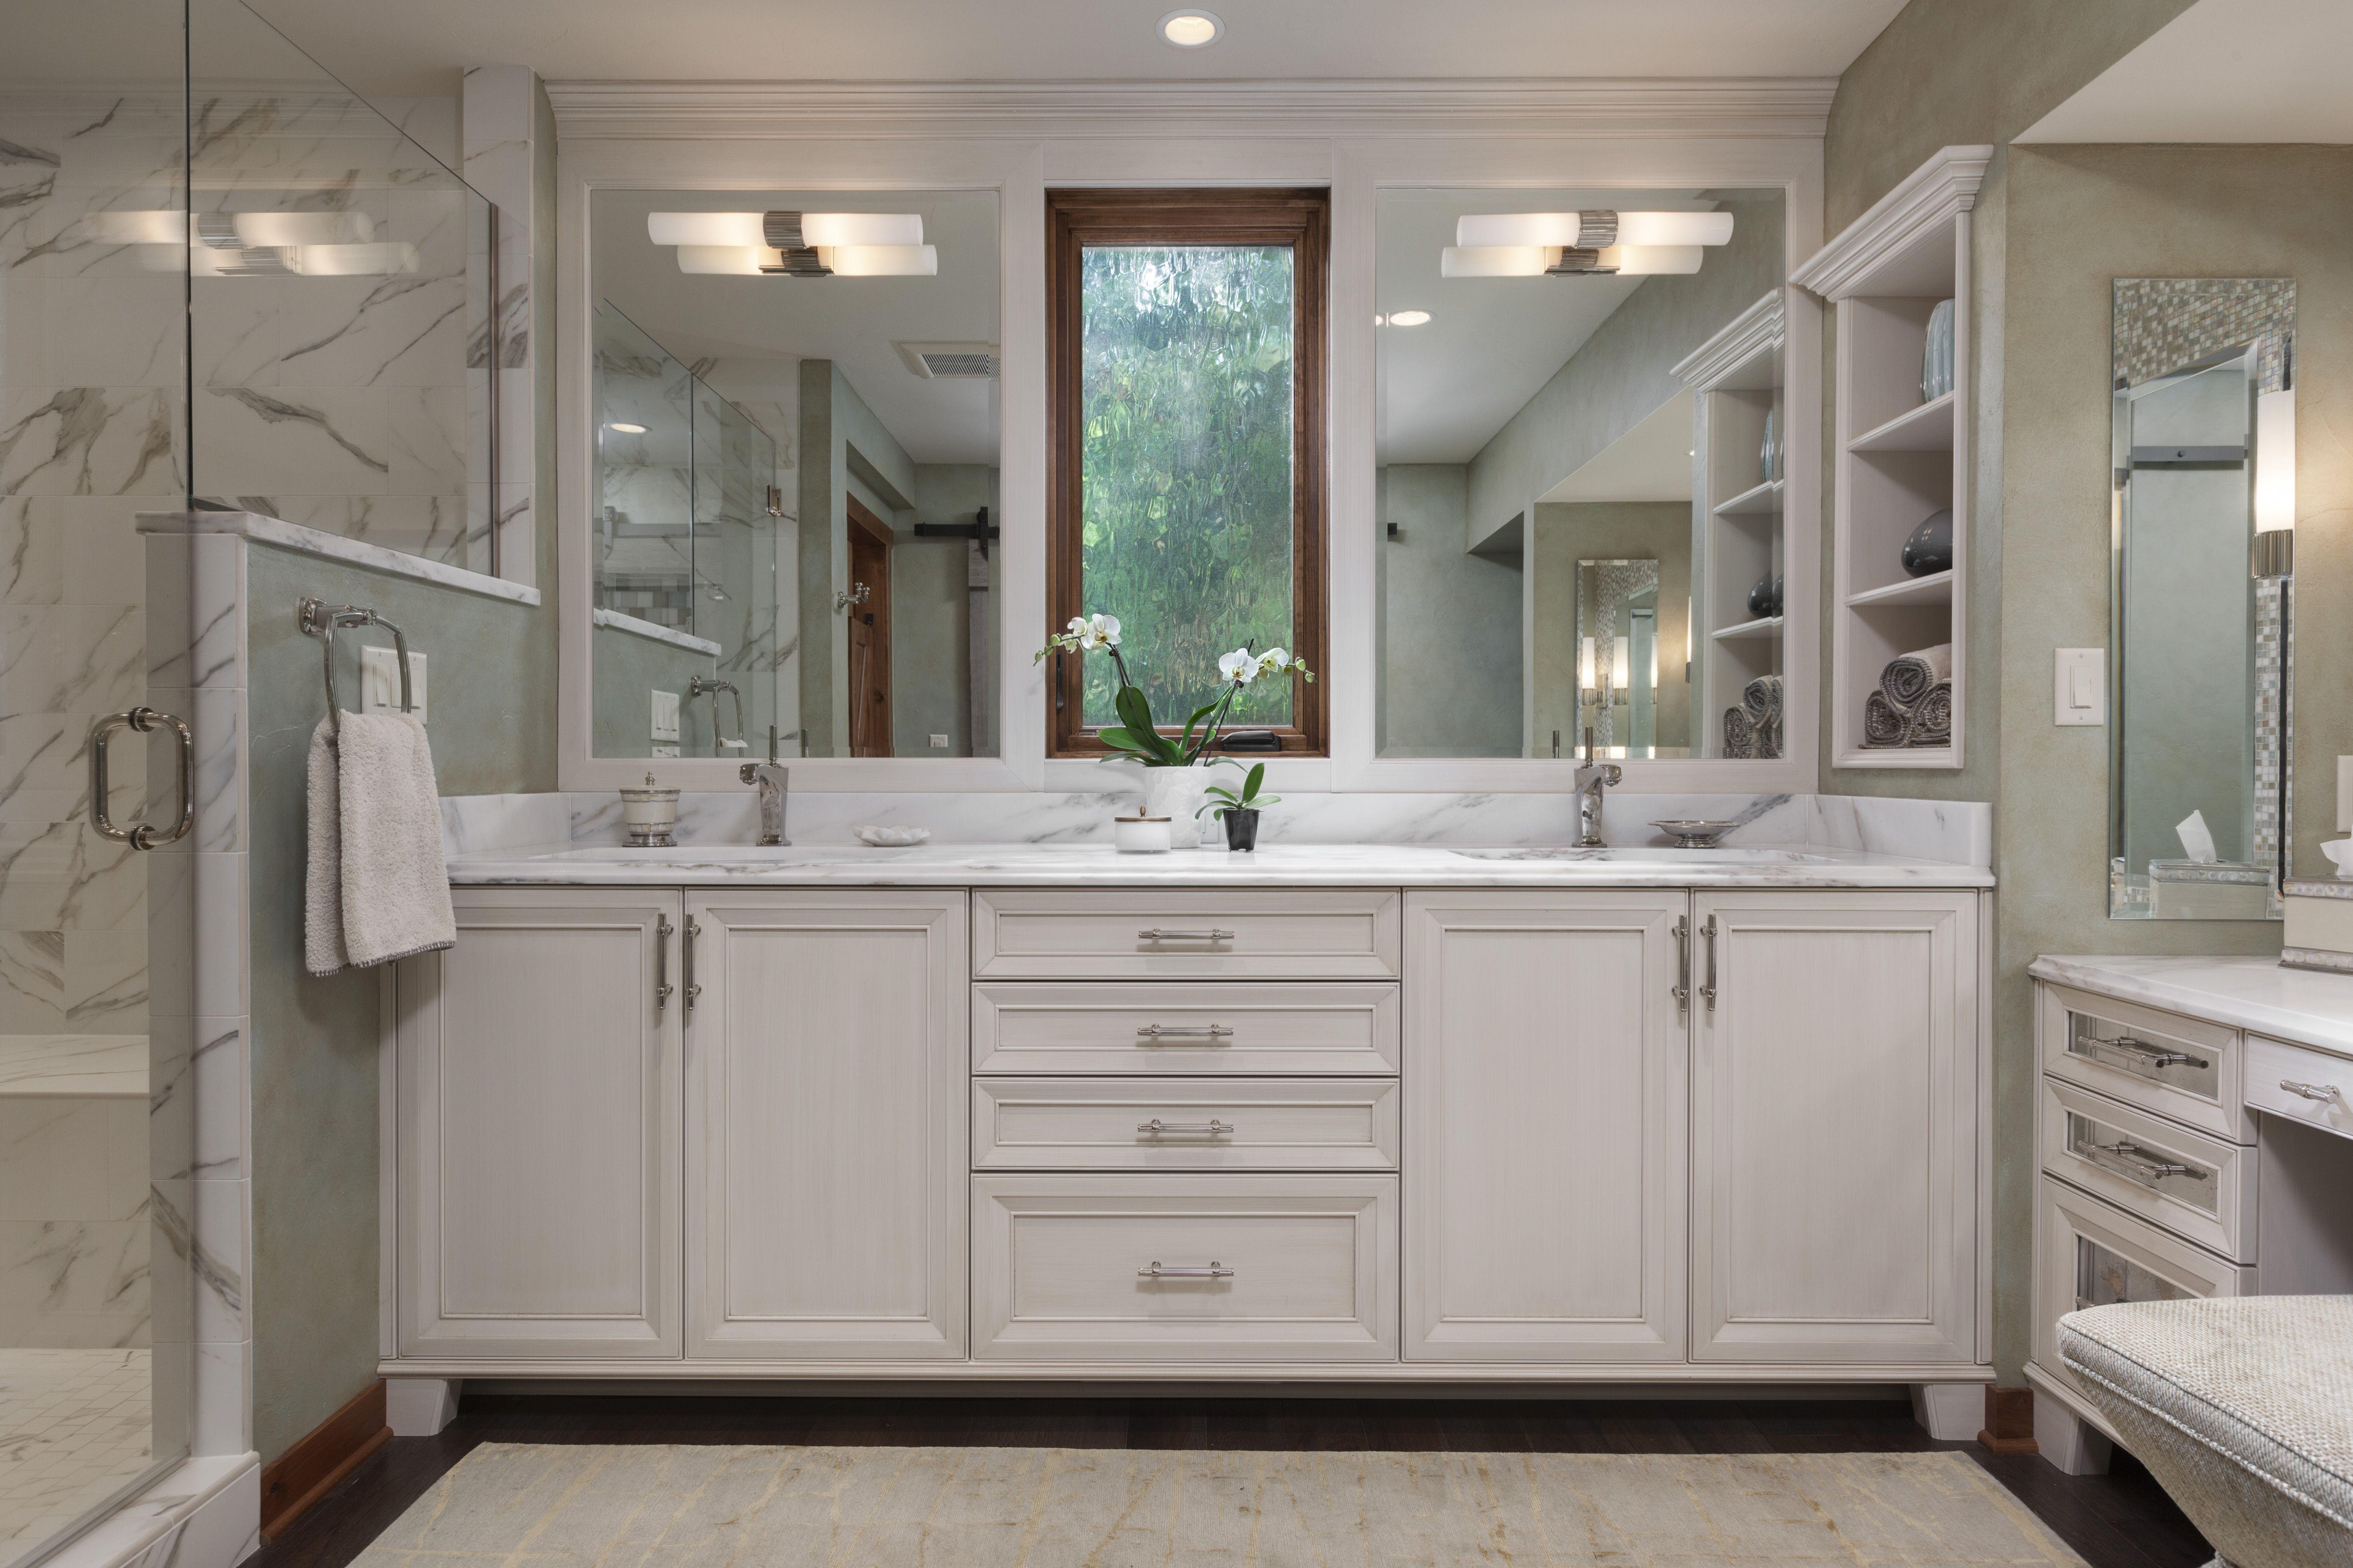 Vasca Da Bagno Karen : Refined rustic master suite karen kempf interiors master bath